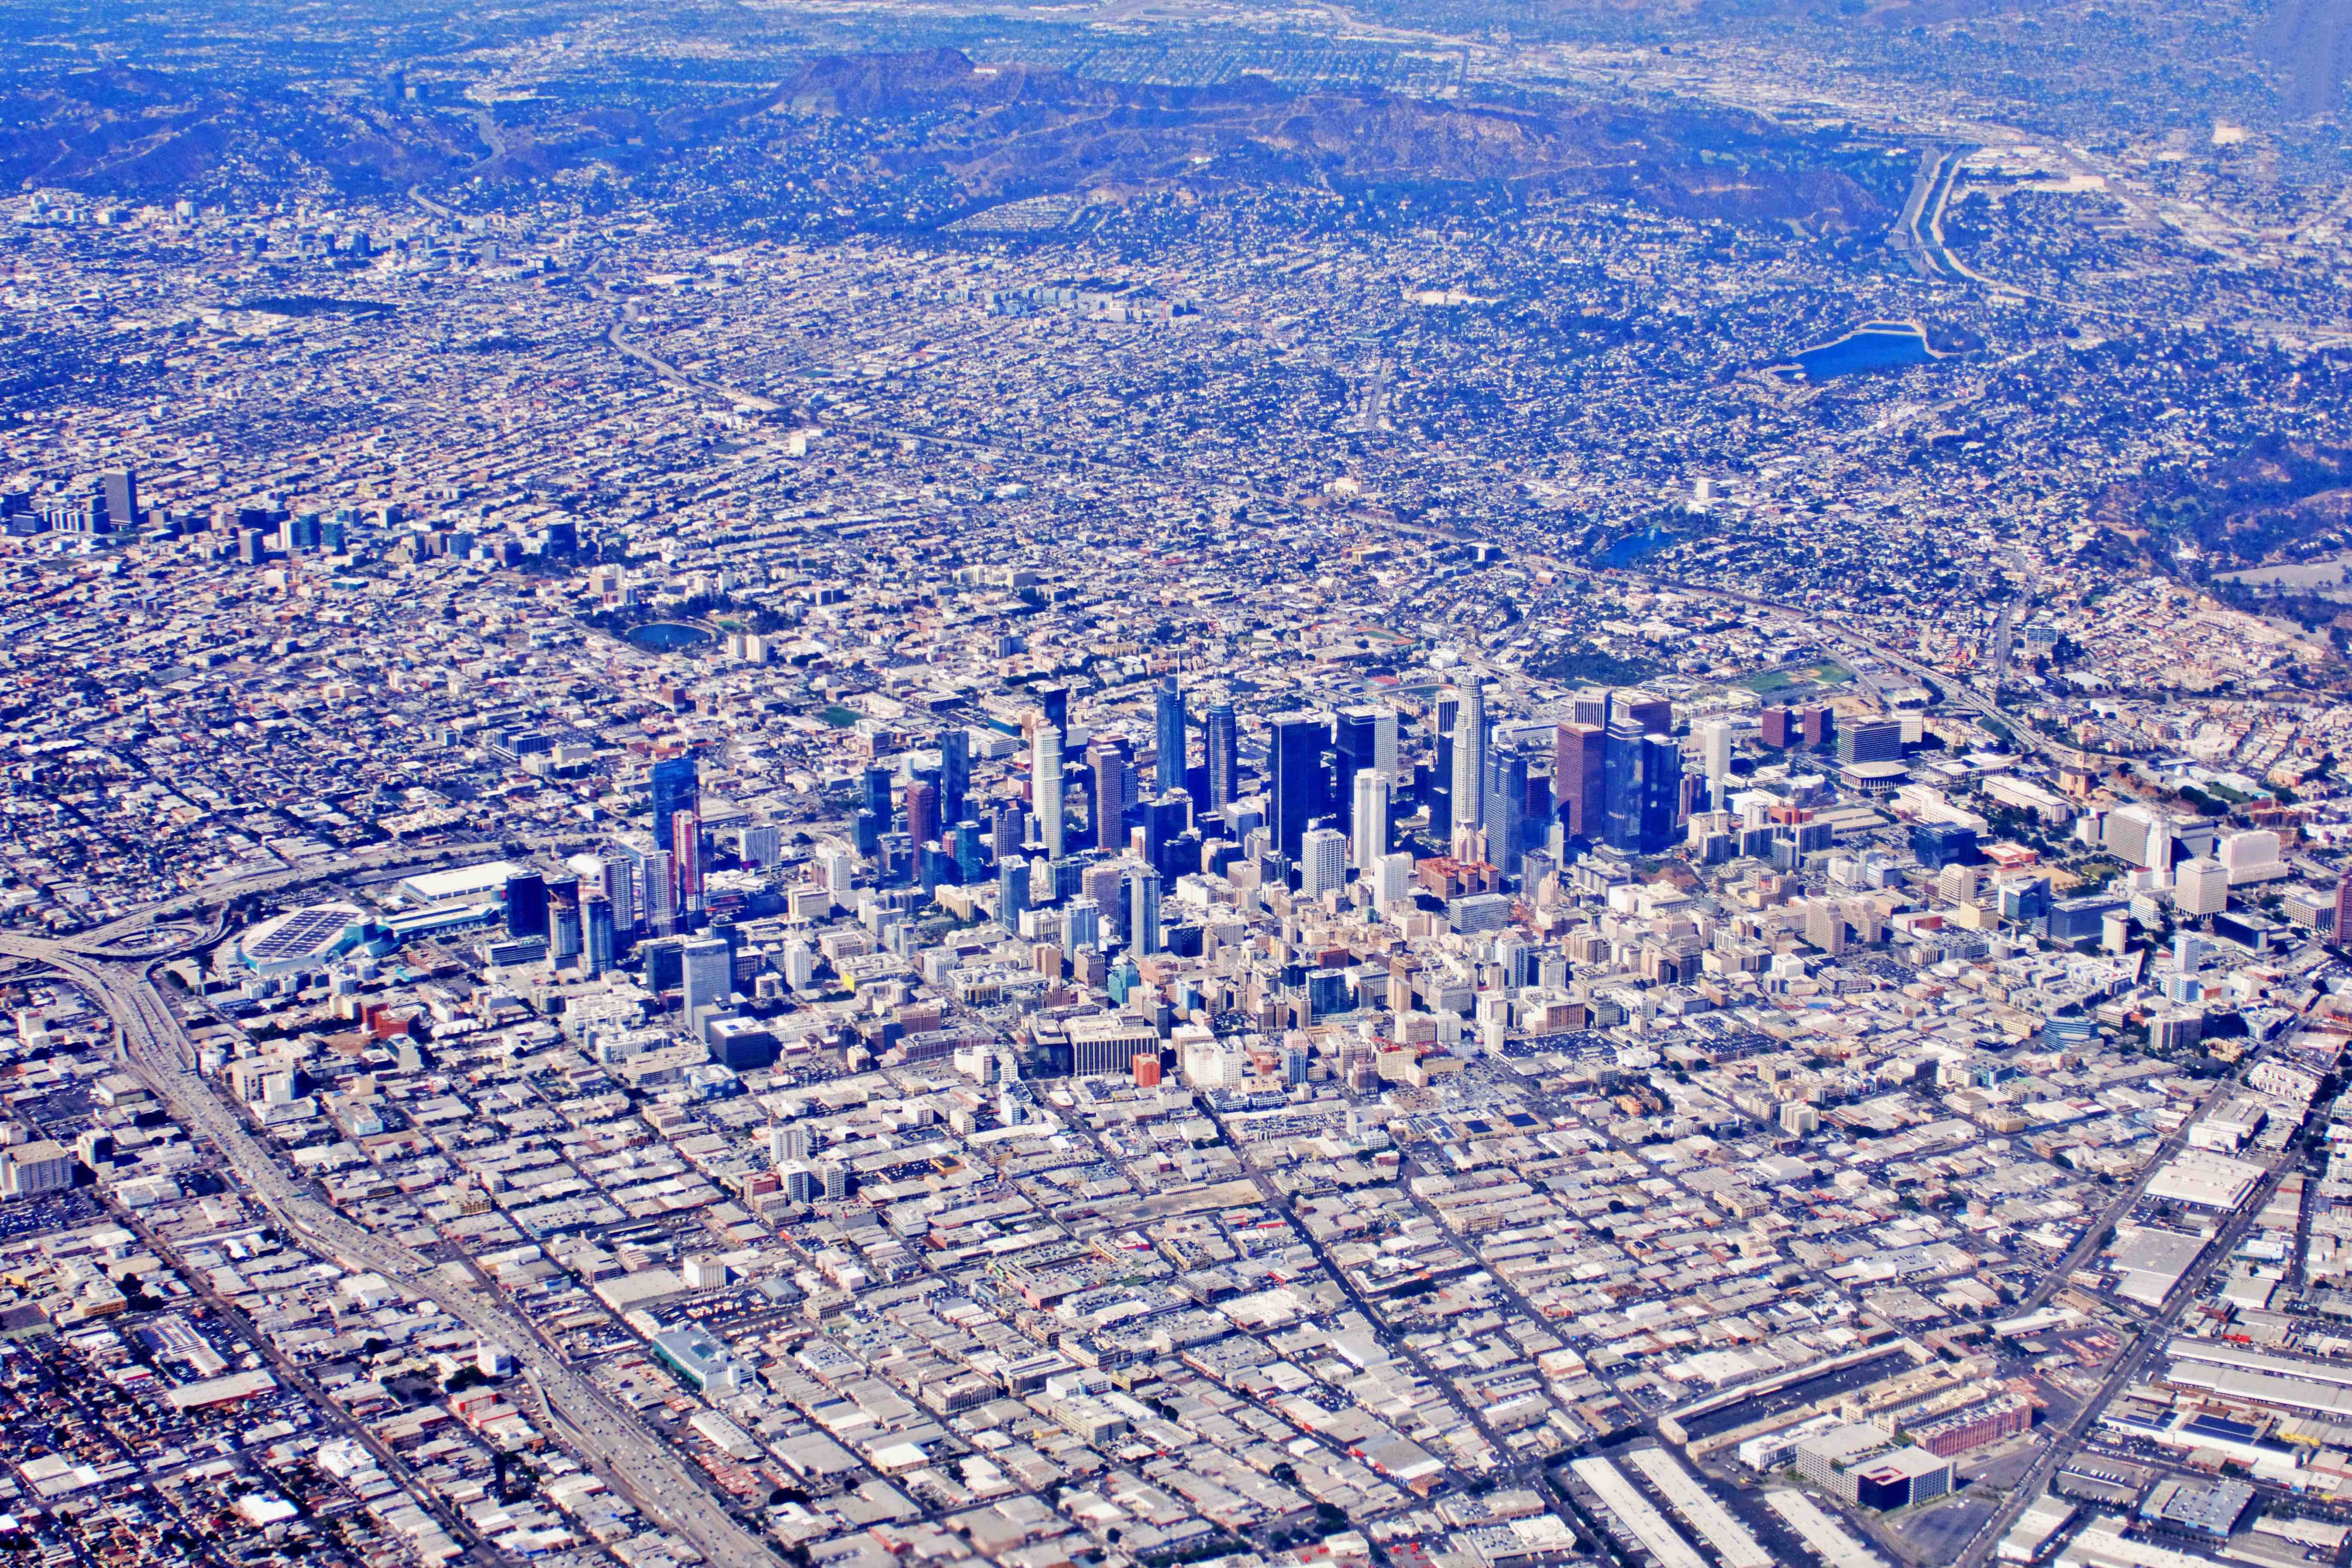 Birdseye view of Los Angeles